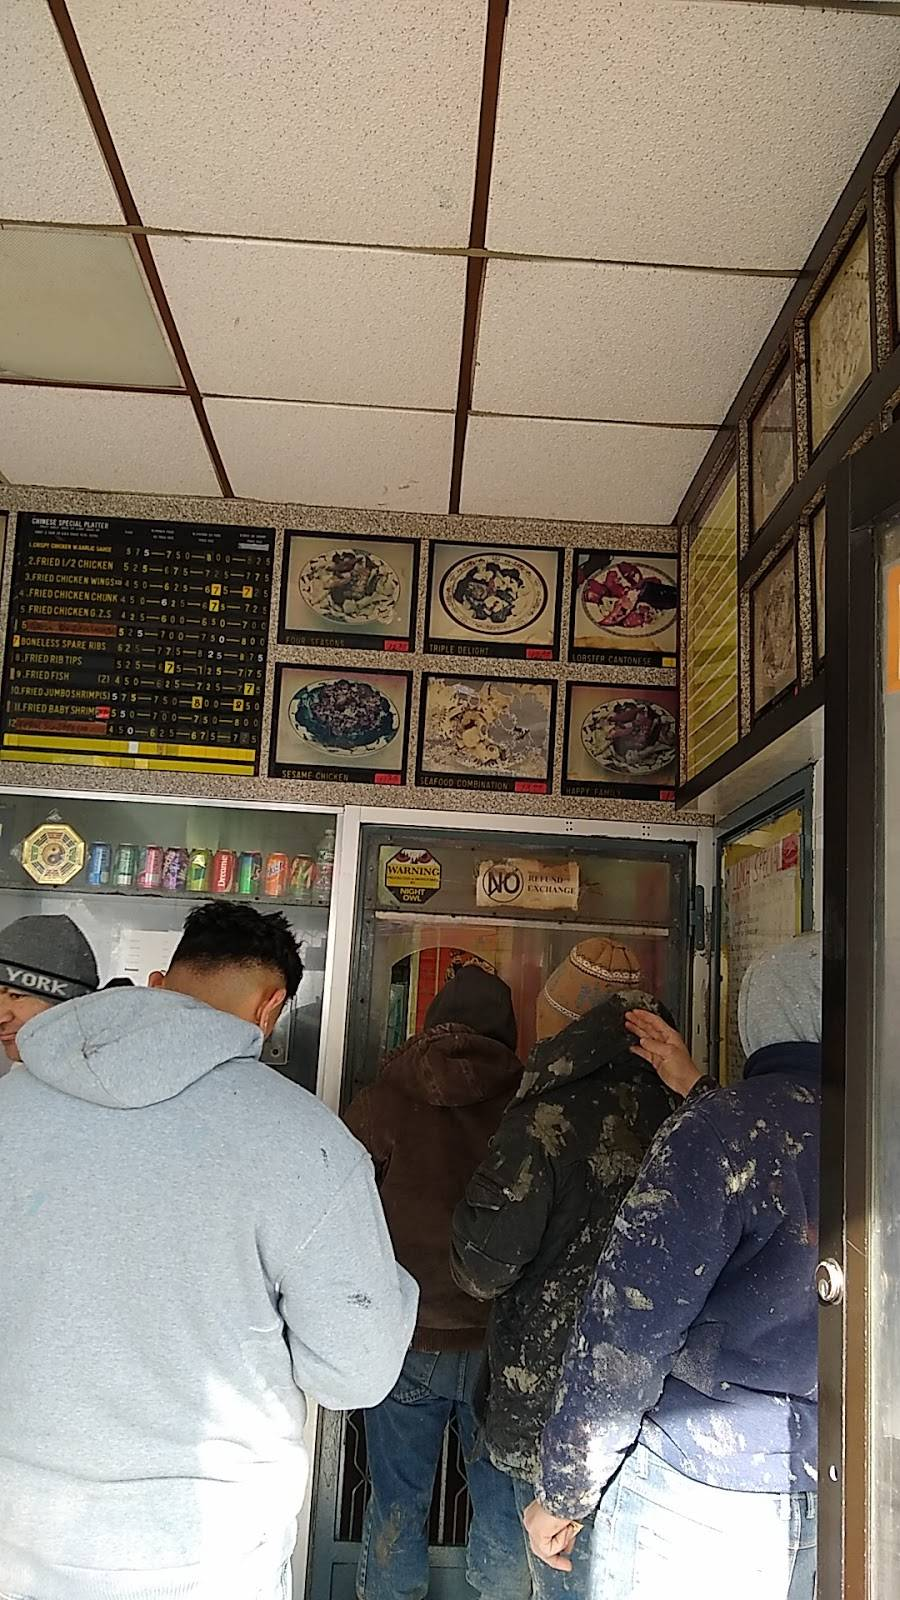 China Panda | restaurant | 351 New Lots Ave, Brooklyn, NY 11207, USA | 7186491622 OR +1 718-649-1622